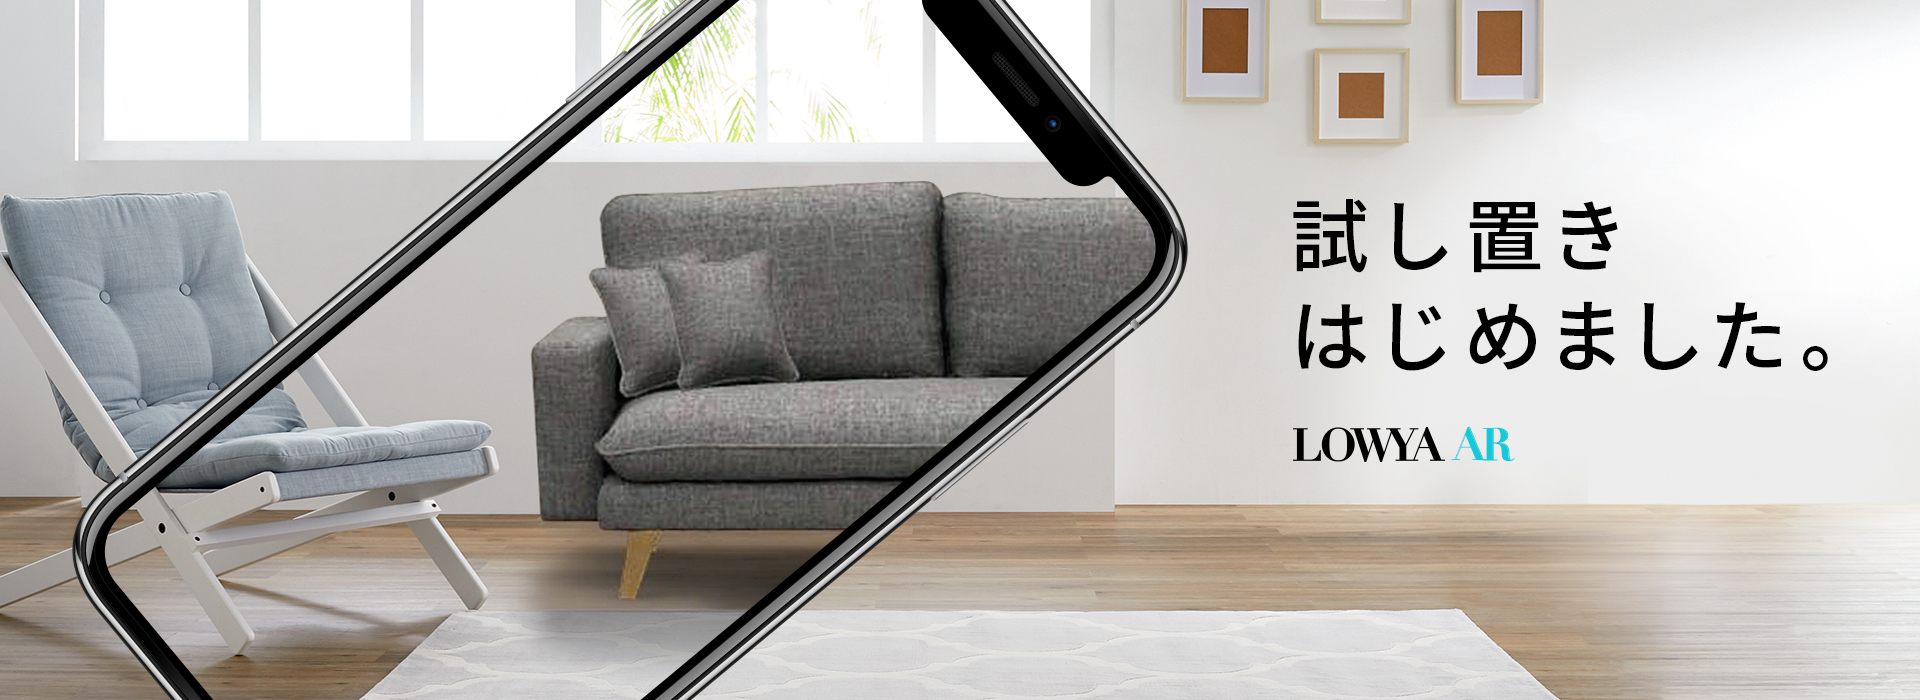 ARで家具配置をシュミレーションしてみよう!アプリ不要の便利な「LOWYA AR」